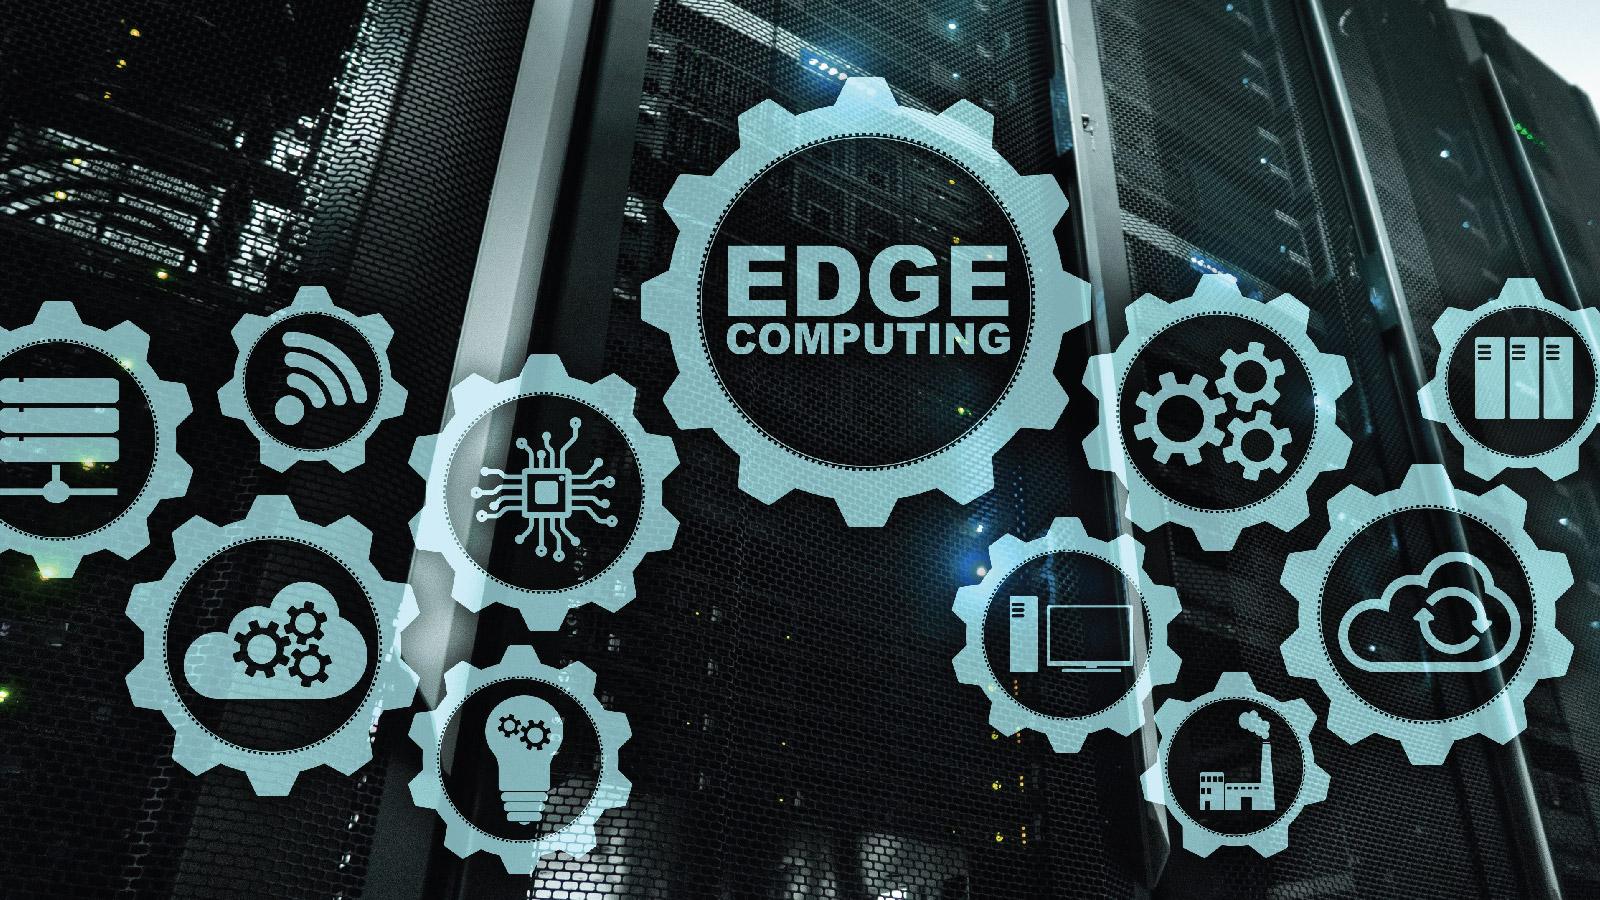 Edge Computing, Digital Transformation, Edge Capture, IoT, Gartner